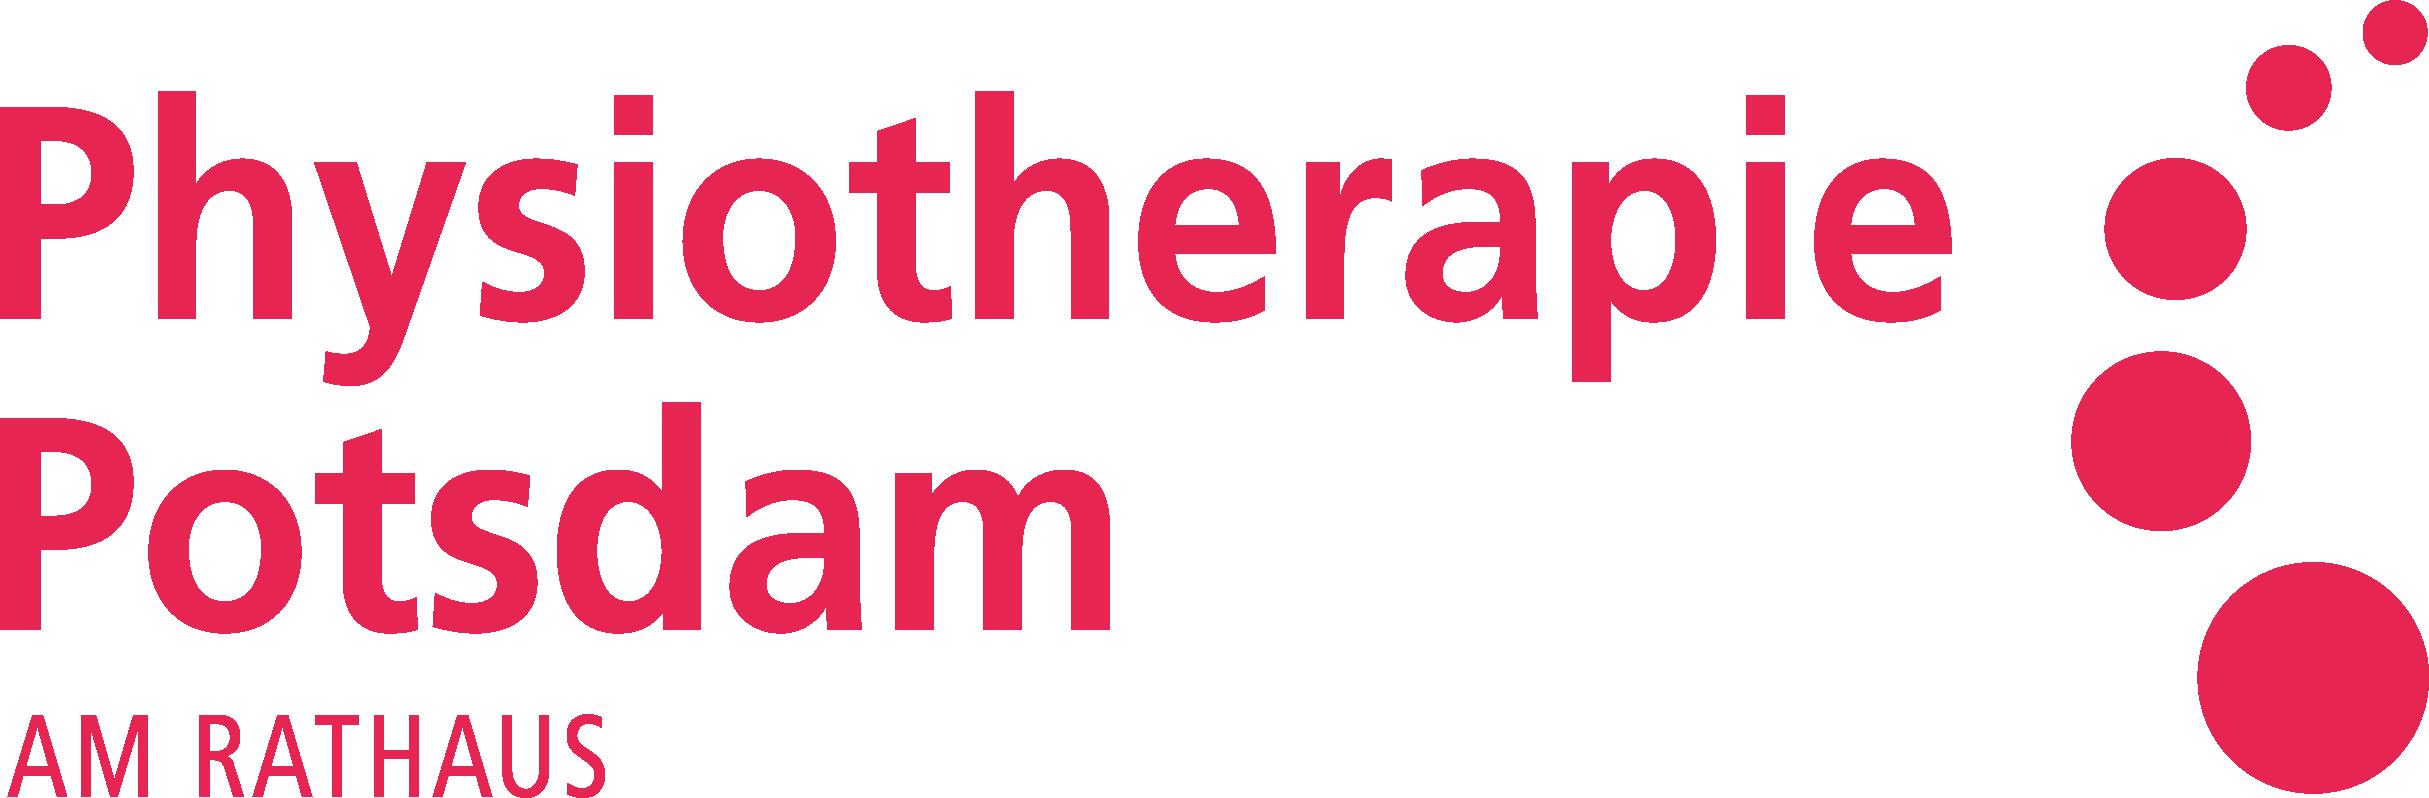 Neu ab 23.09: Physiotherapie Potsdam am Rathaus Logo